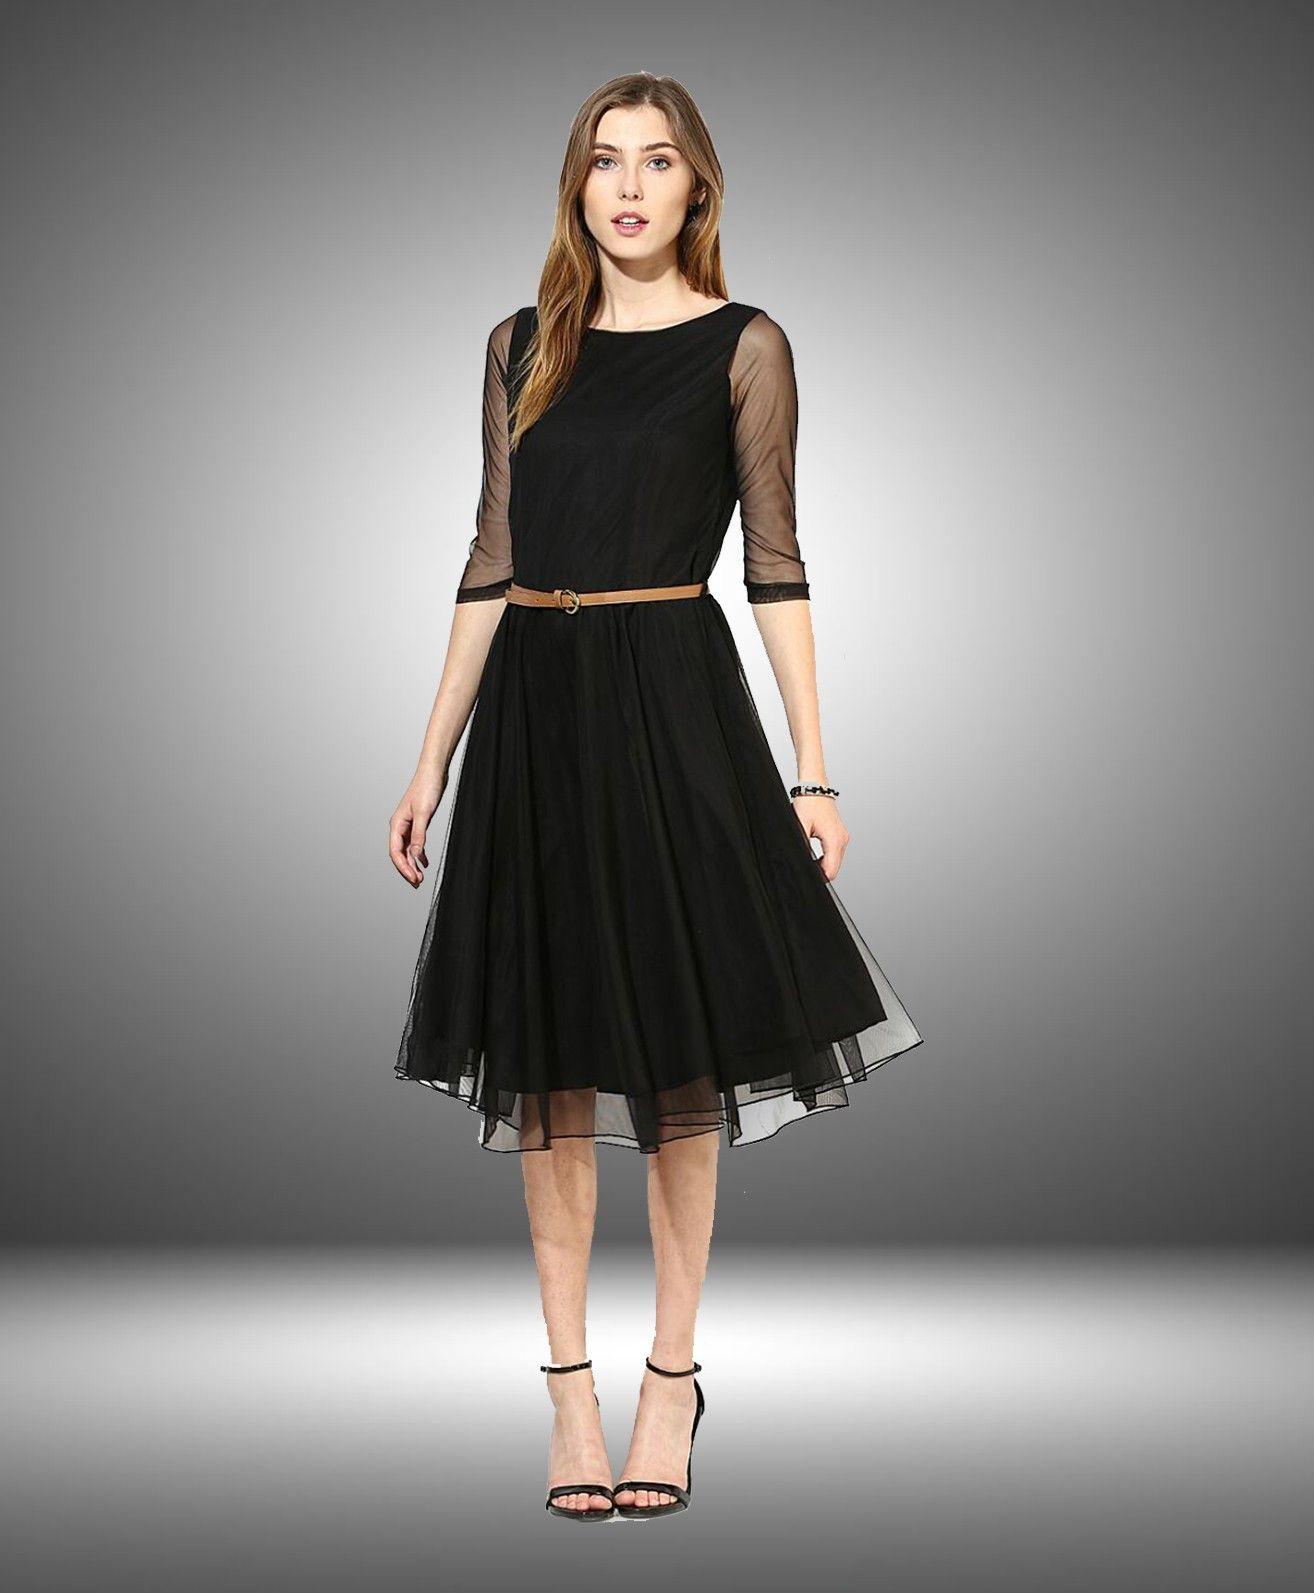 1002f118a791 Beautiful Black Color Plain Skater Dress. | One Piece Dresses ...